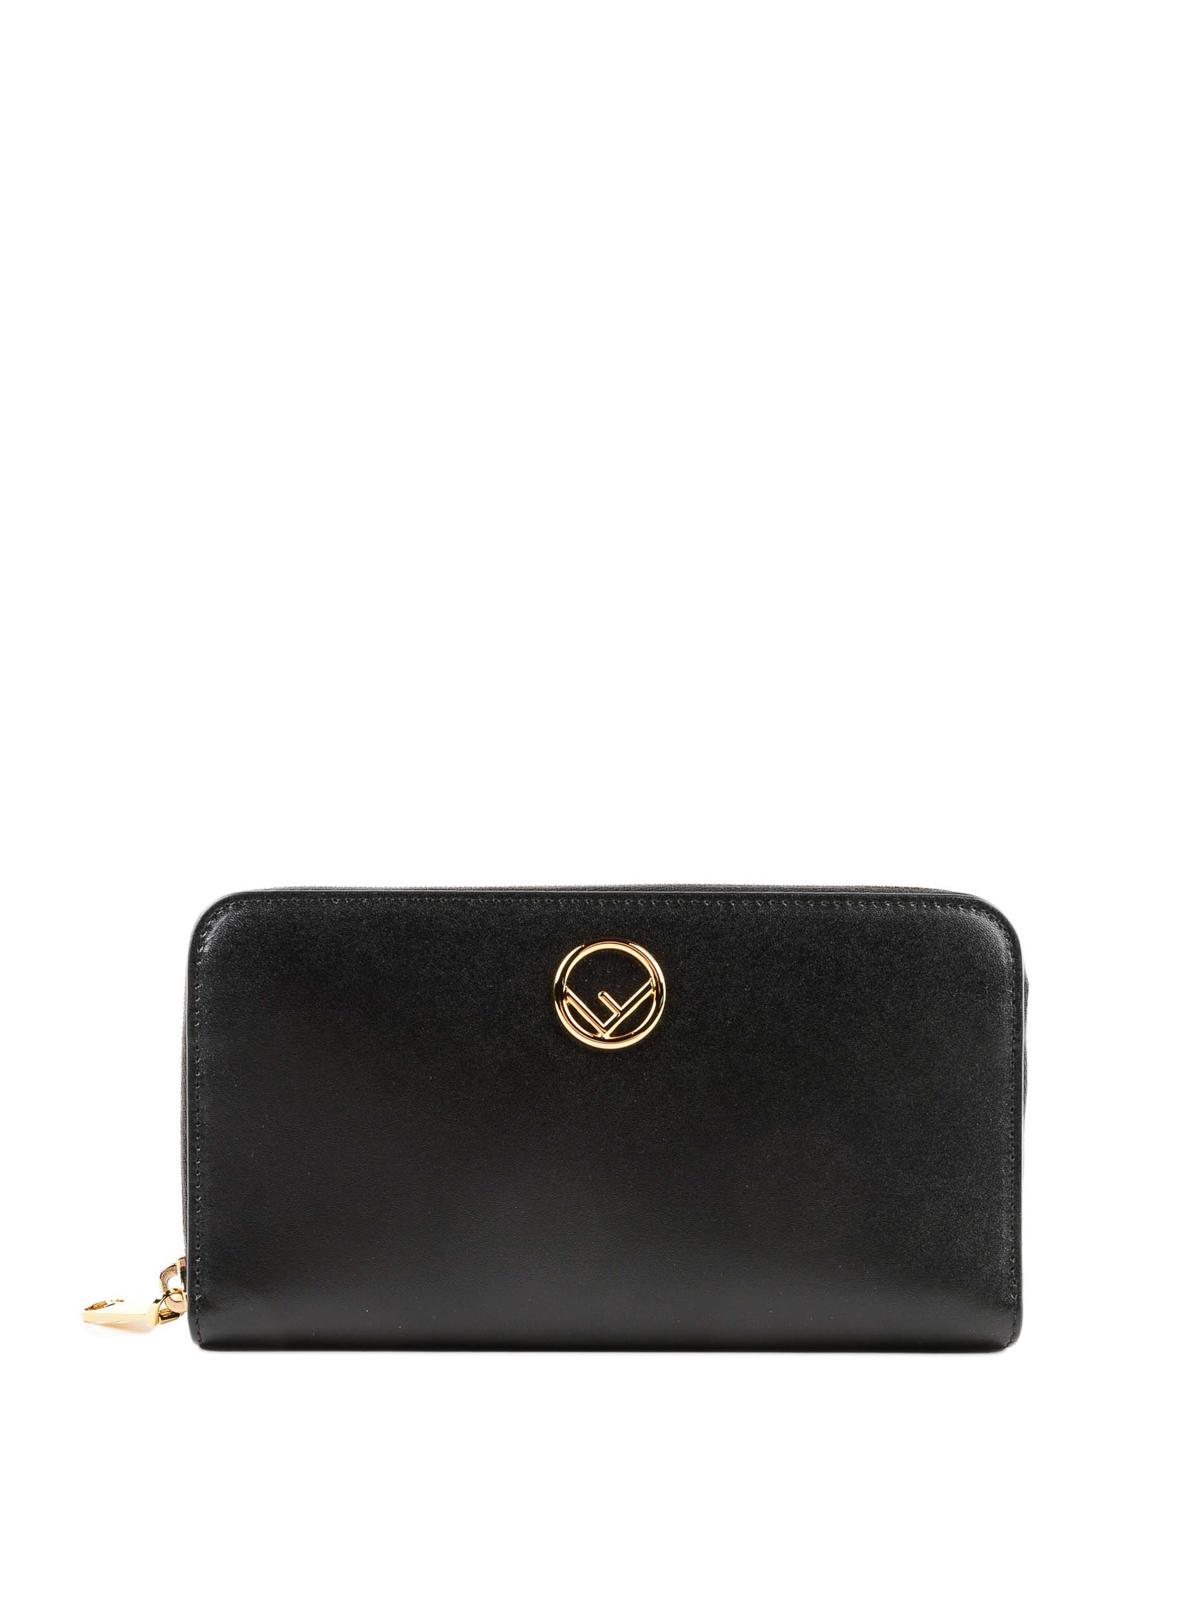 0a98049e093c FENDI  wallets   purses - F is Fendi black leather zip around wallet